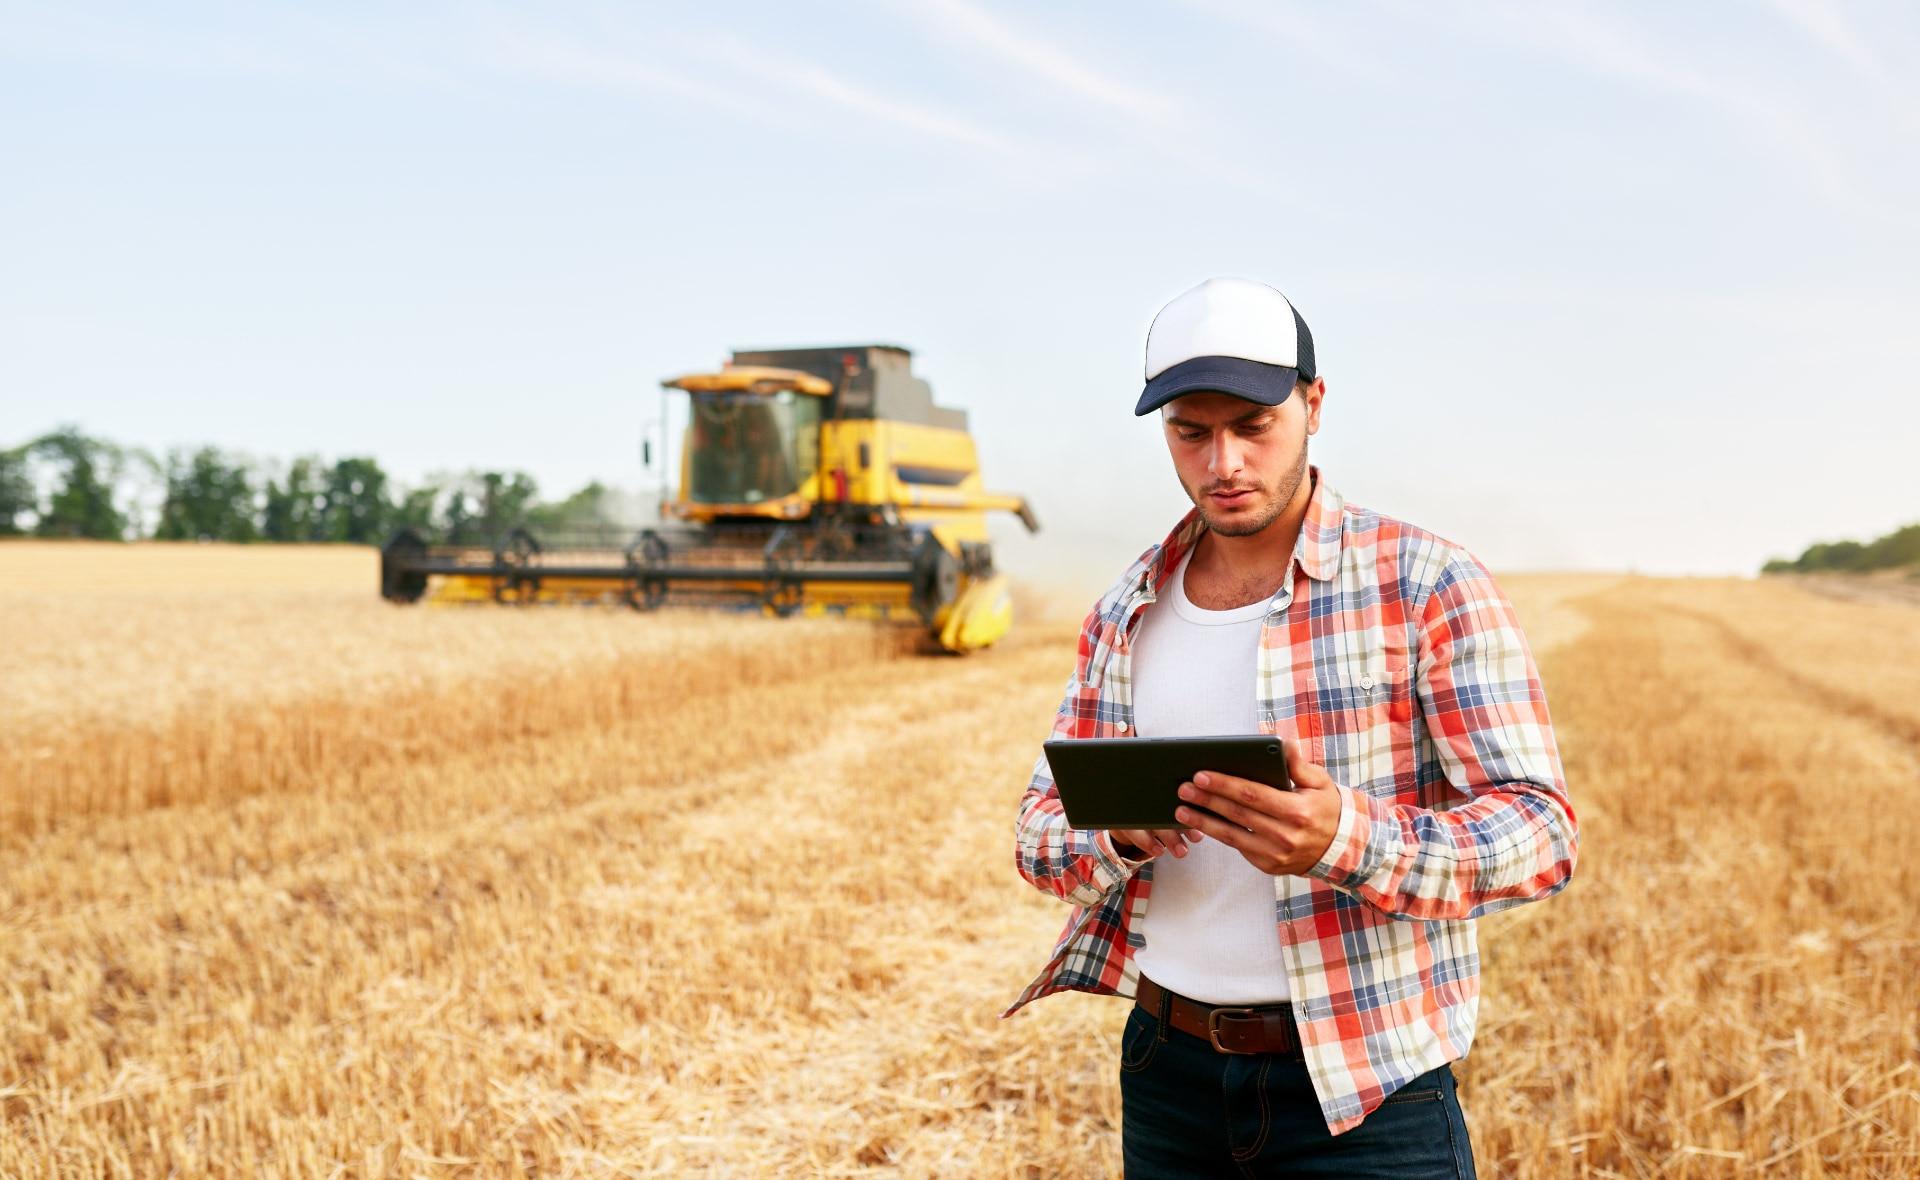 agricultura_precisión-sostenible-campo